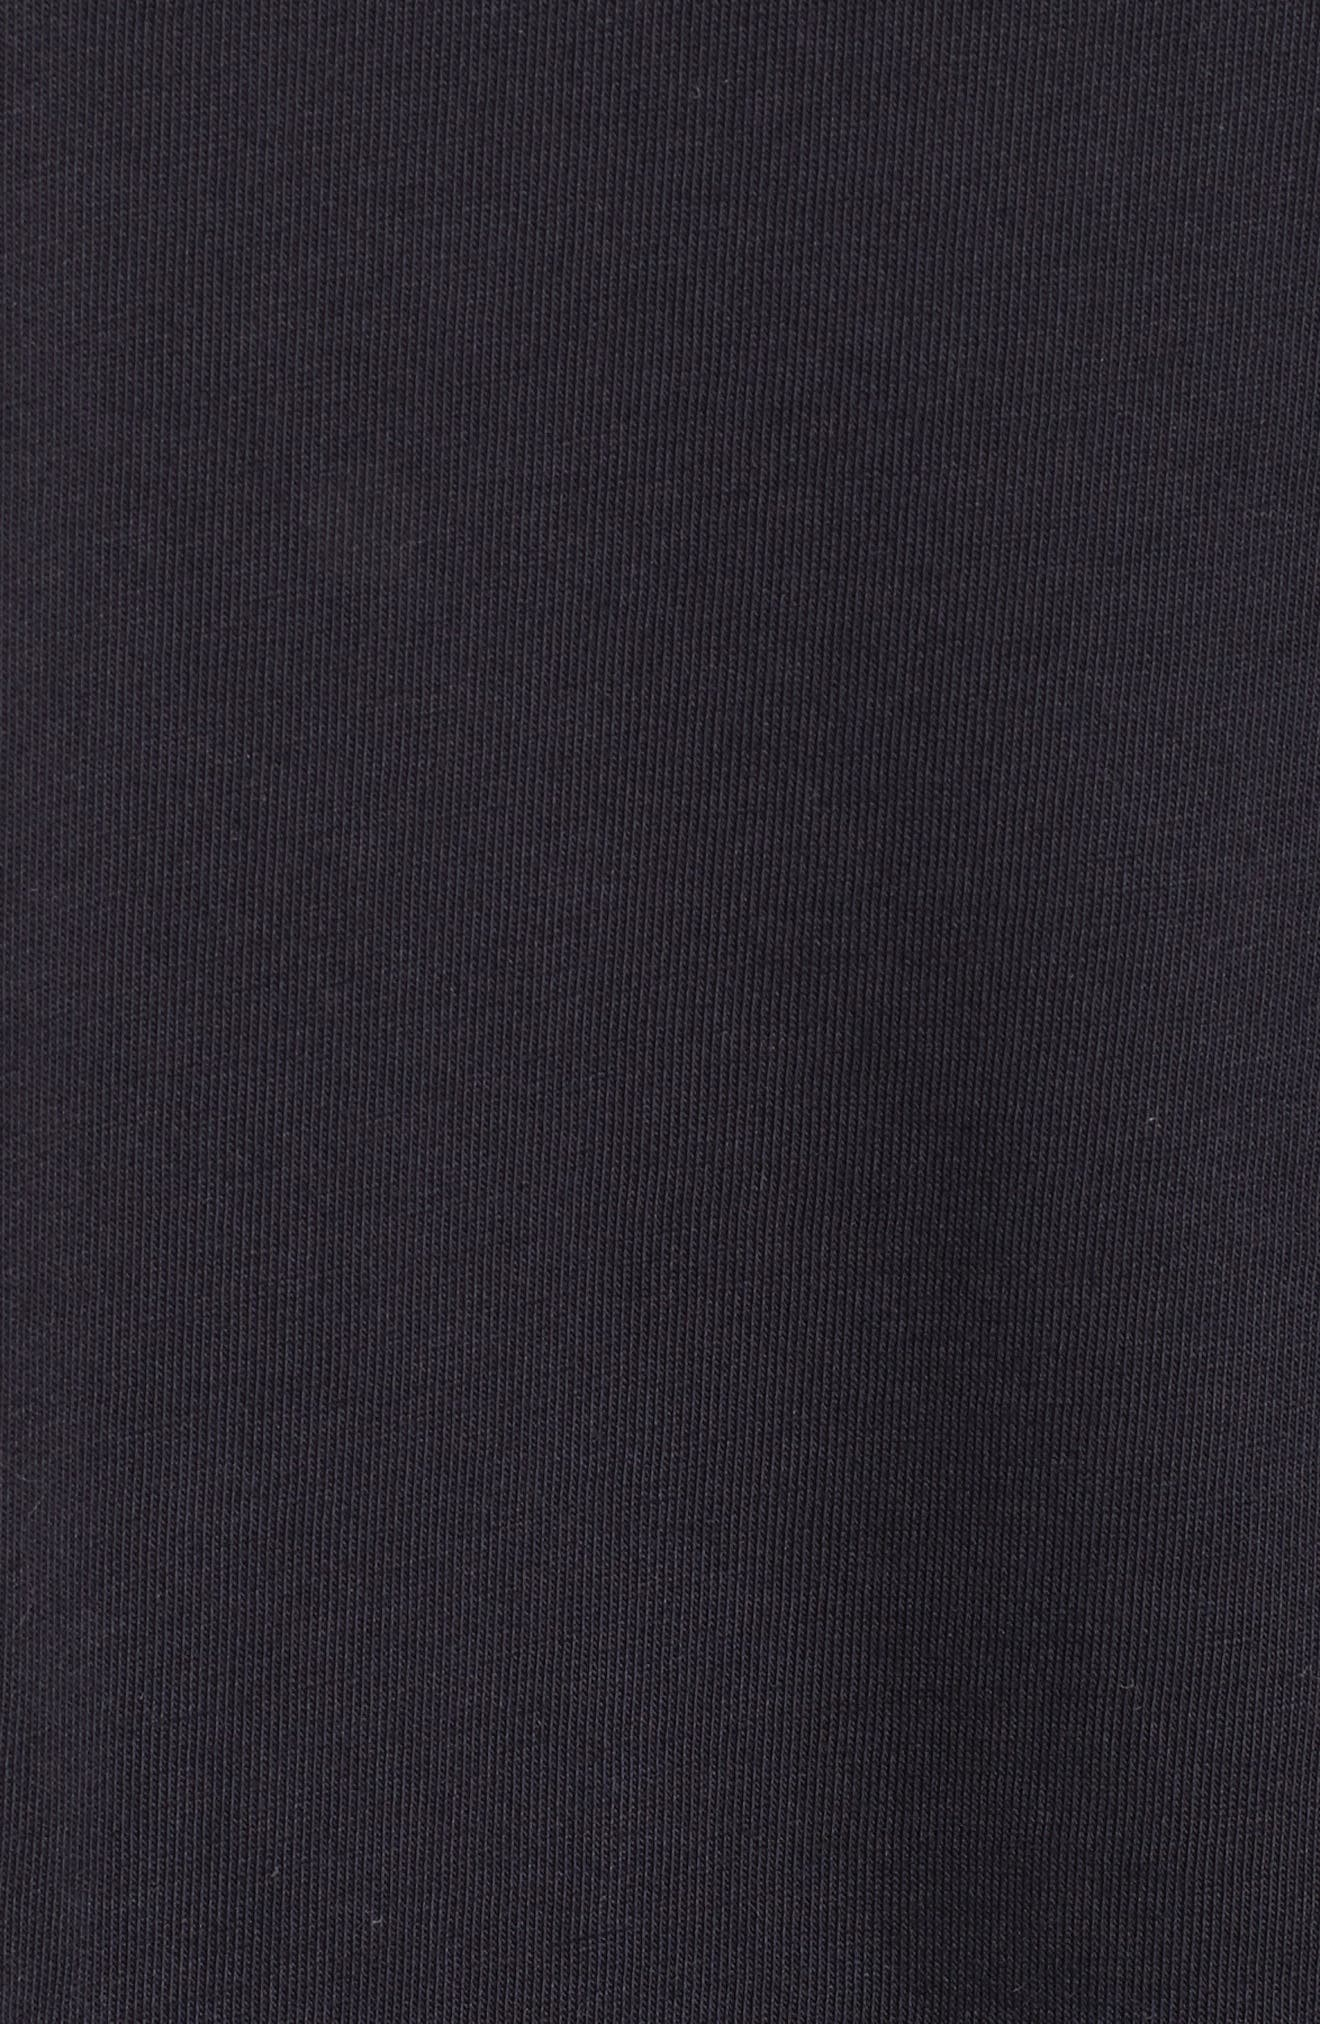 Lace Trim Bell Sleeve Top,                             Alternate thumbnail 5, color,                             Black